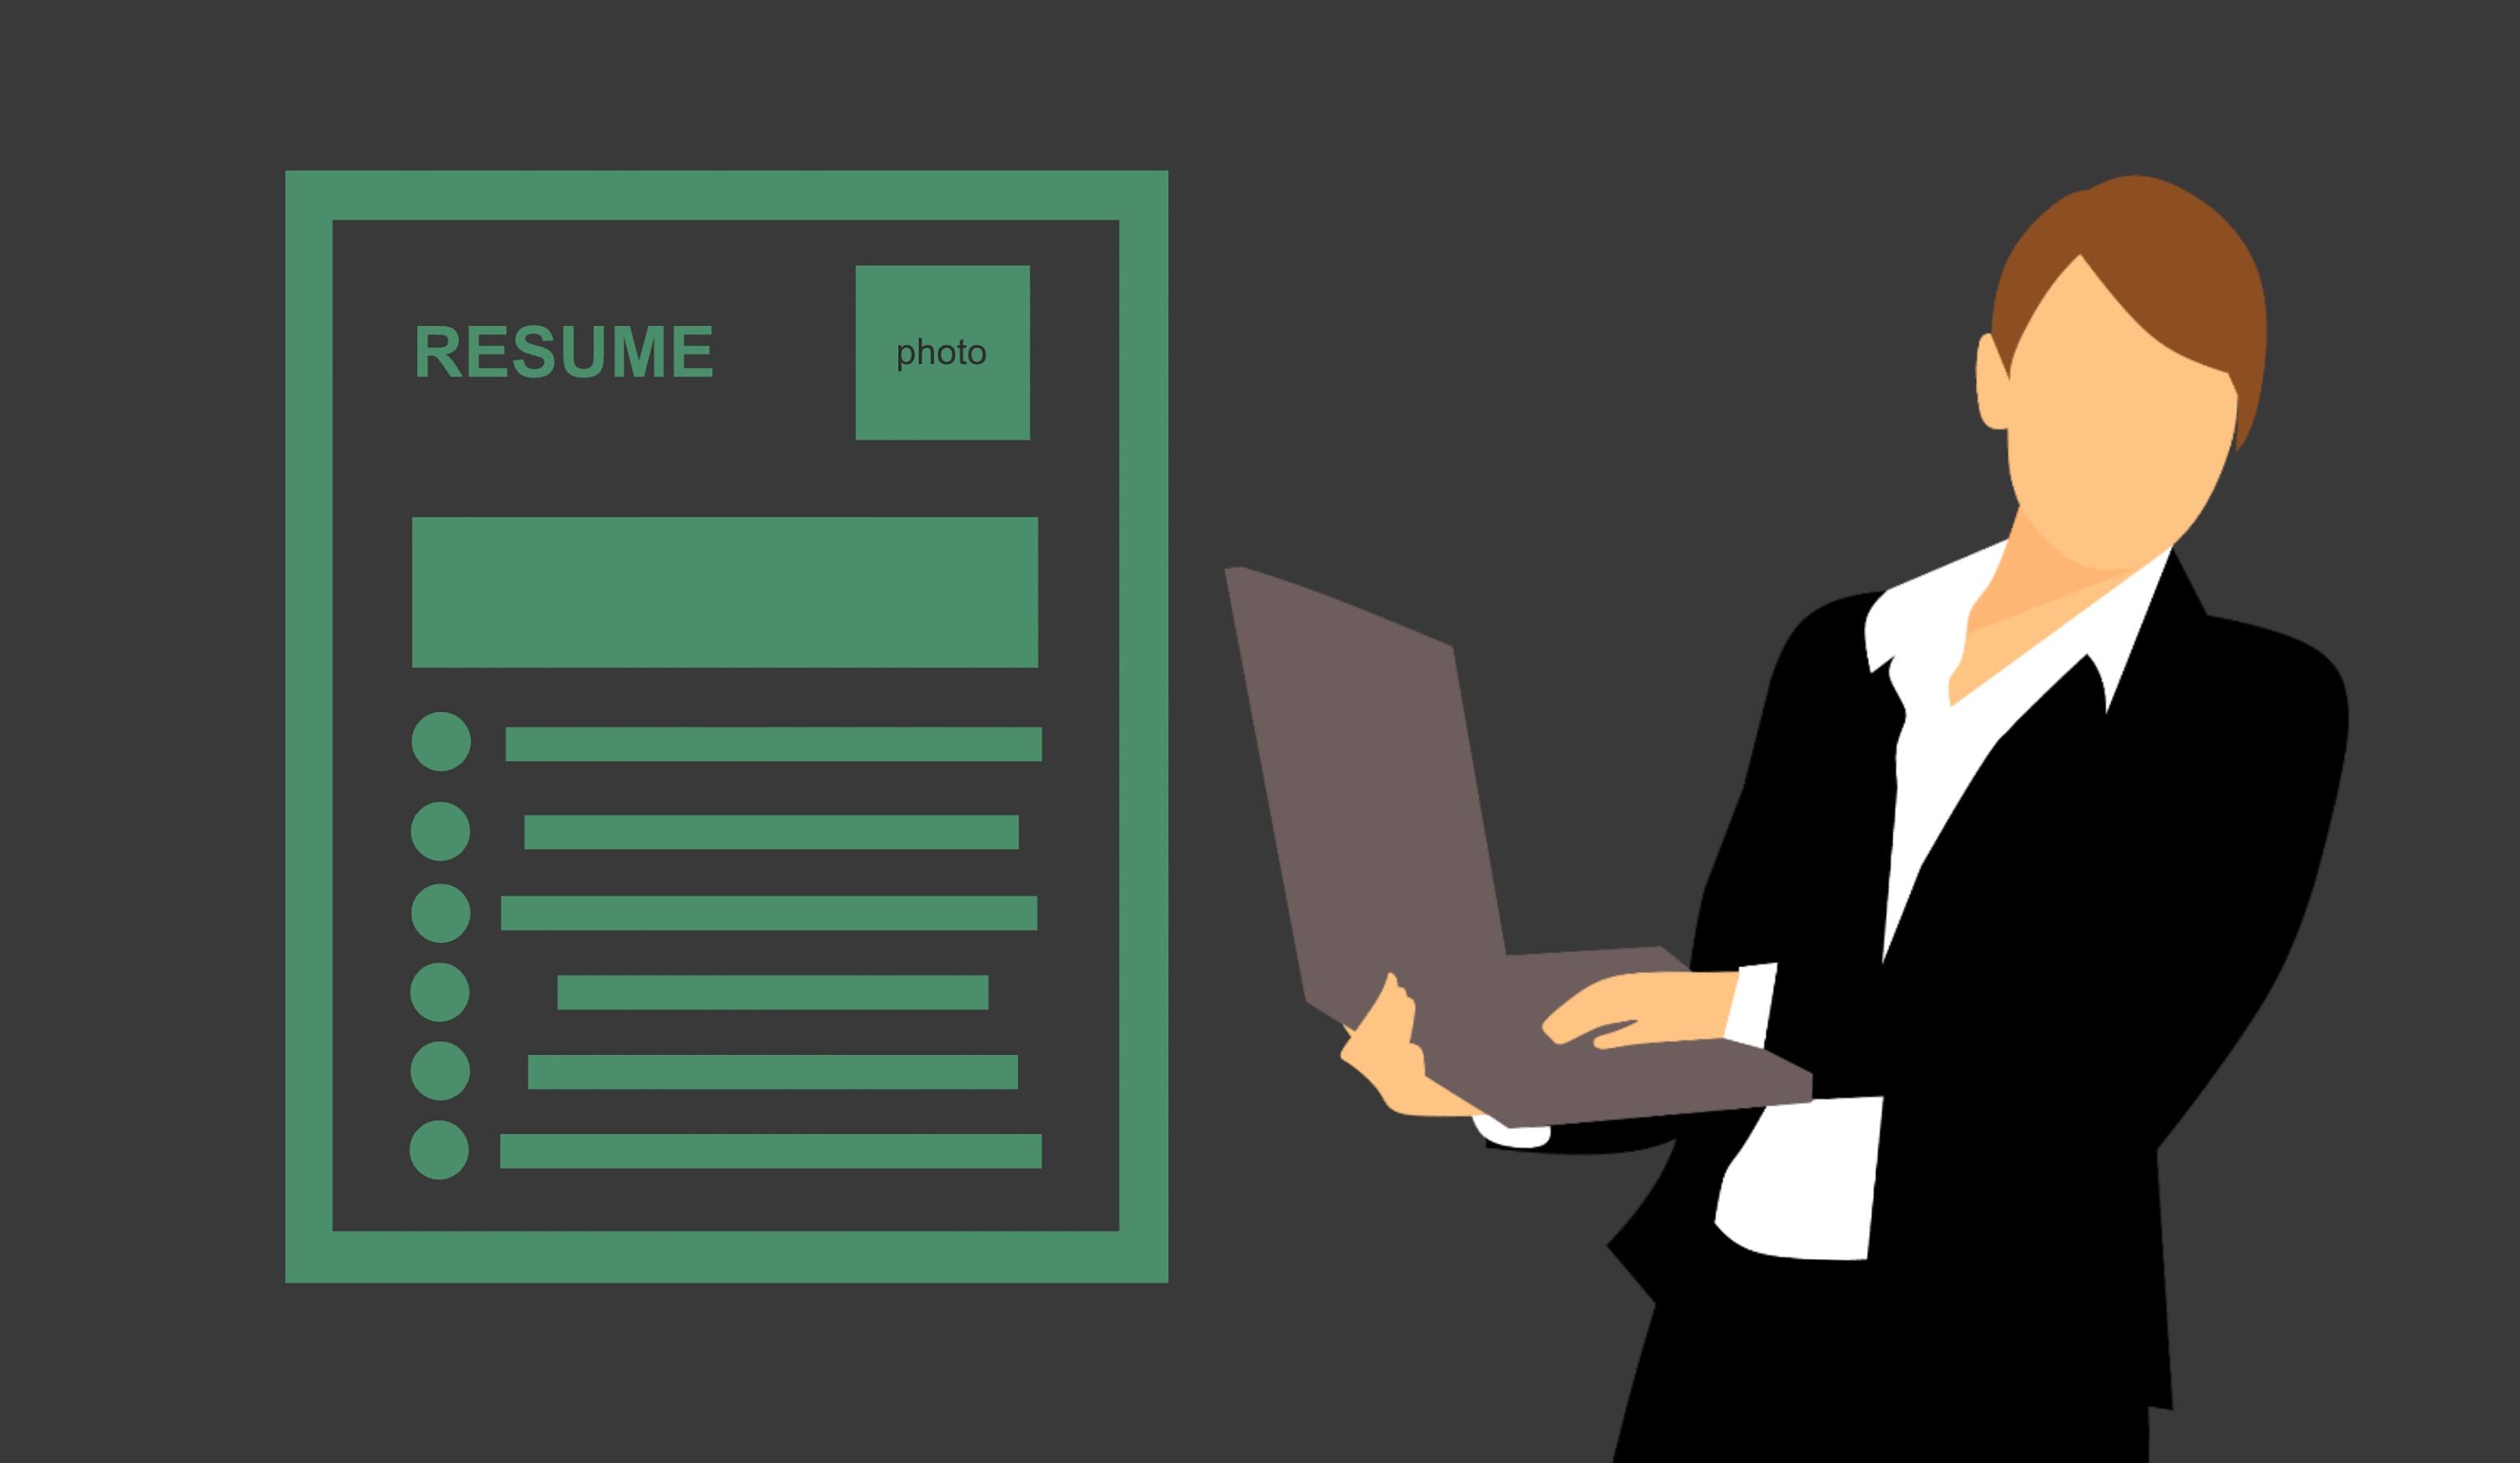 Free Images : career, resume, hiring, job interview, sonaaf